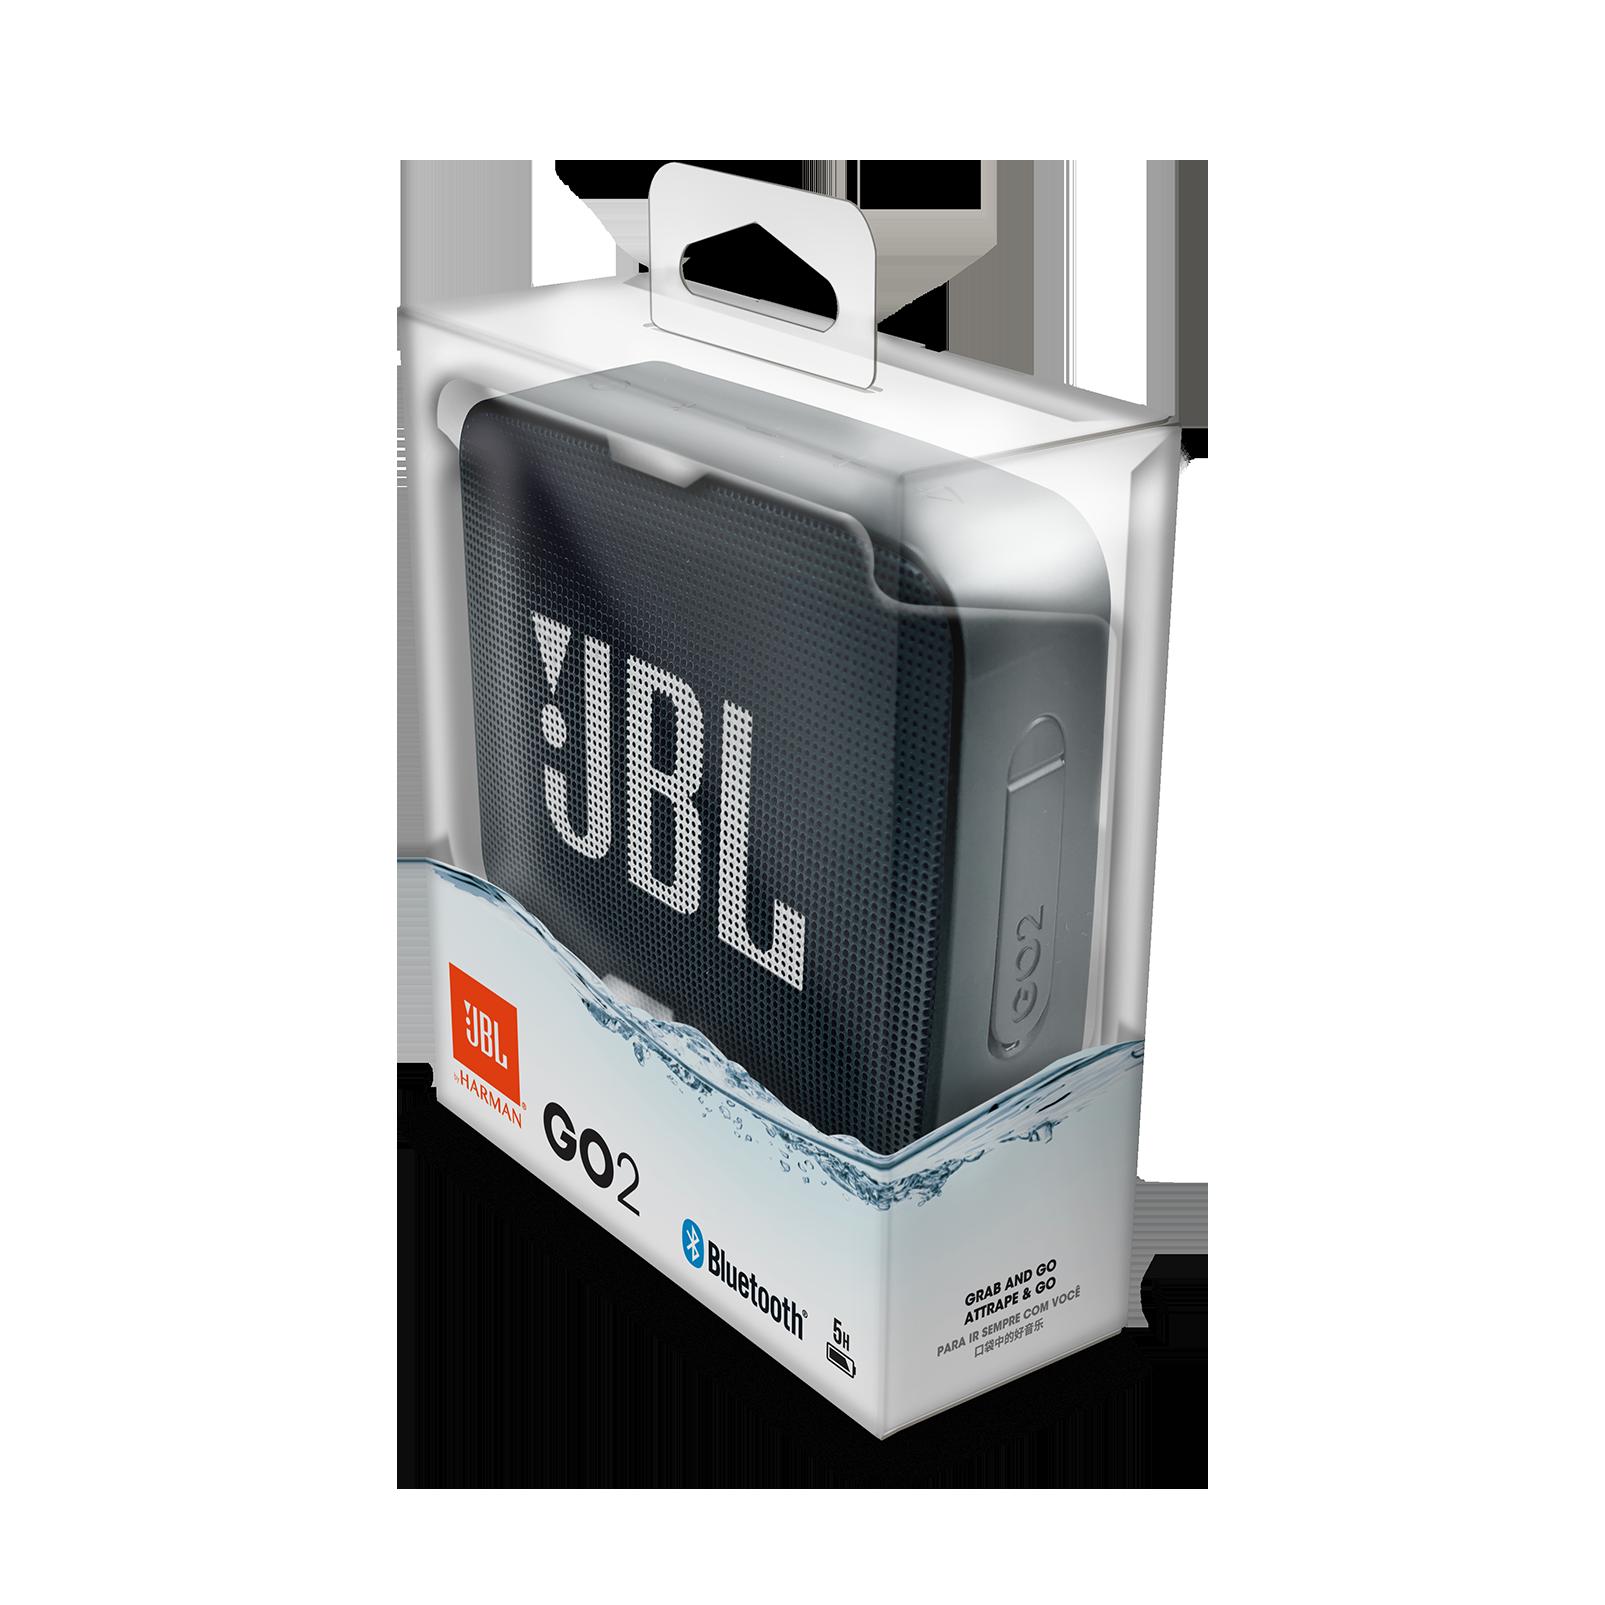 Jbl Go 2 Tragbarer Bluetooth Lautsprecher